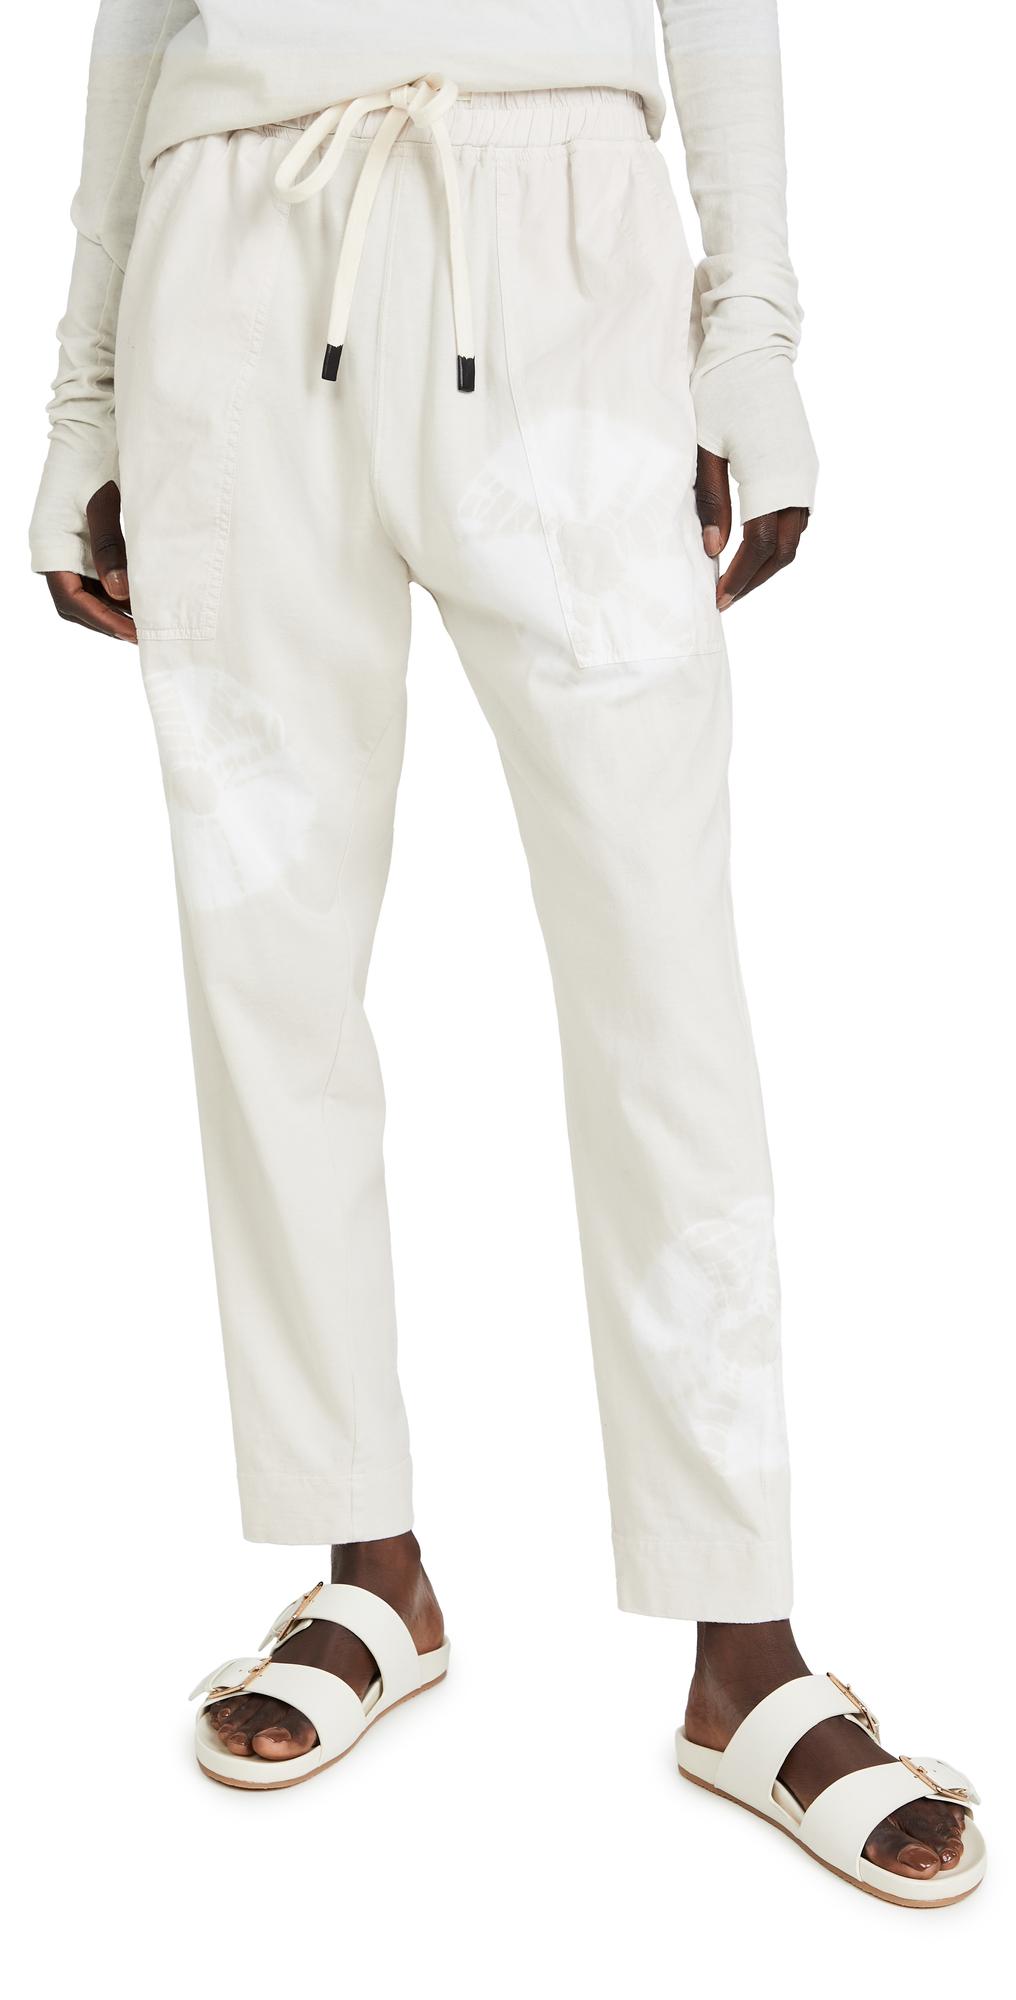 Karamatsu Print Double Jersey Pants